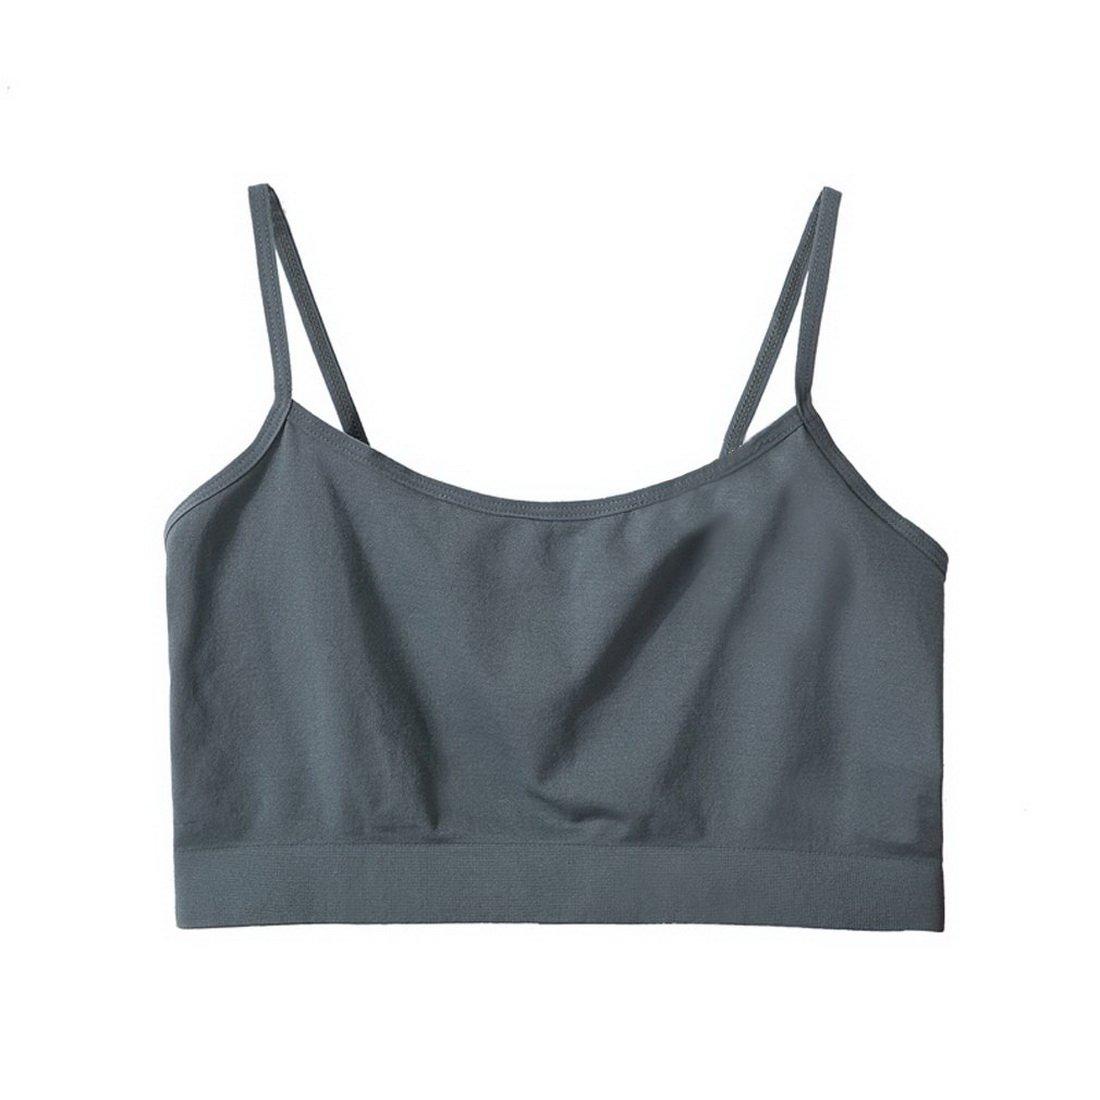 TZSJGL Lady Simple Grey Solid Color Half Cami Basic Seamless Mini Camisole